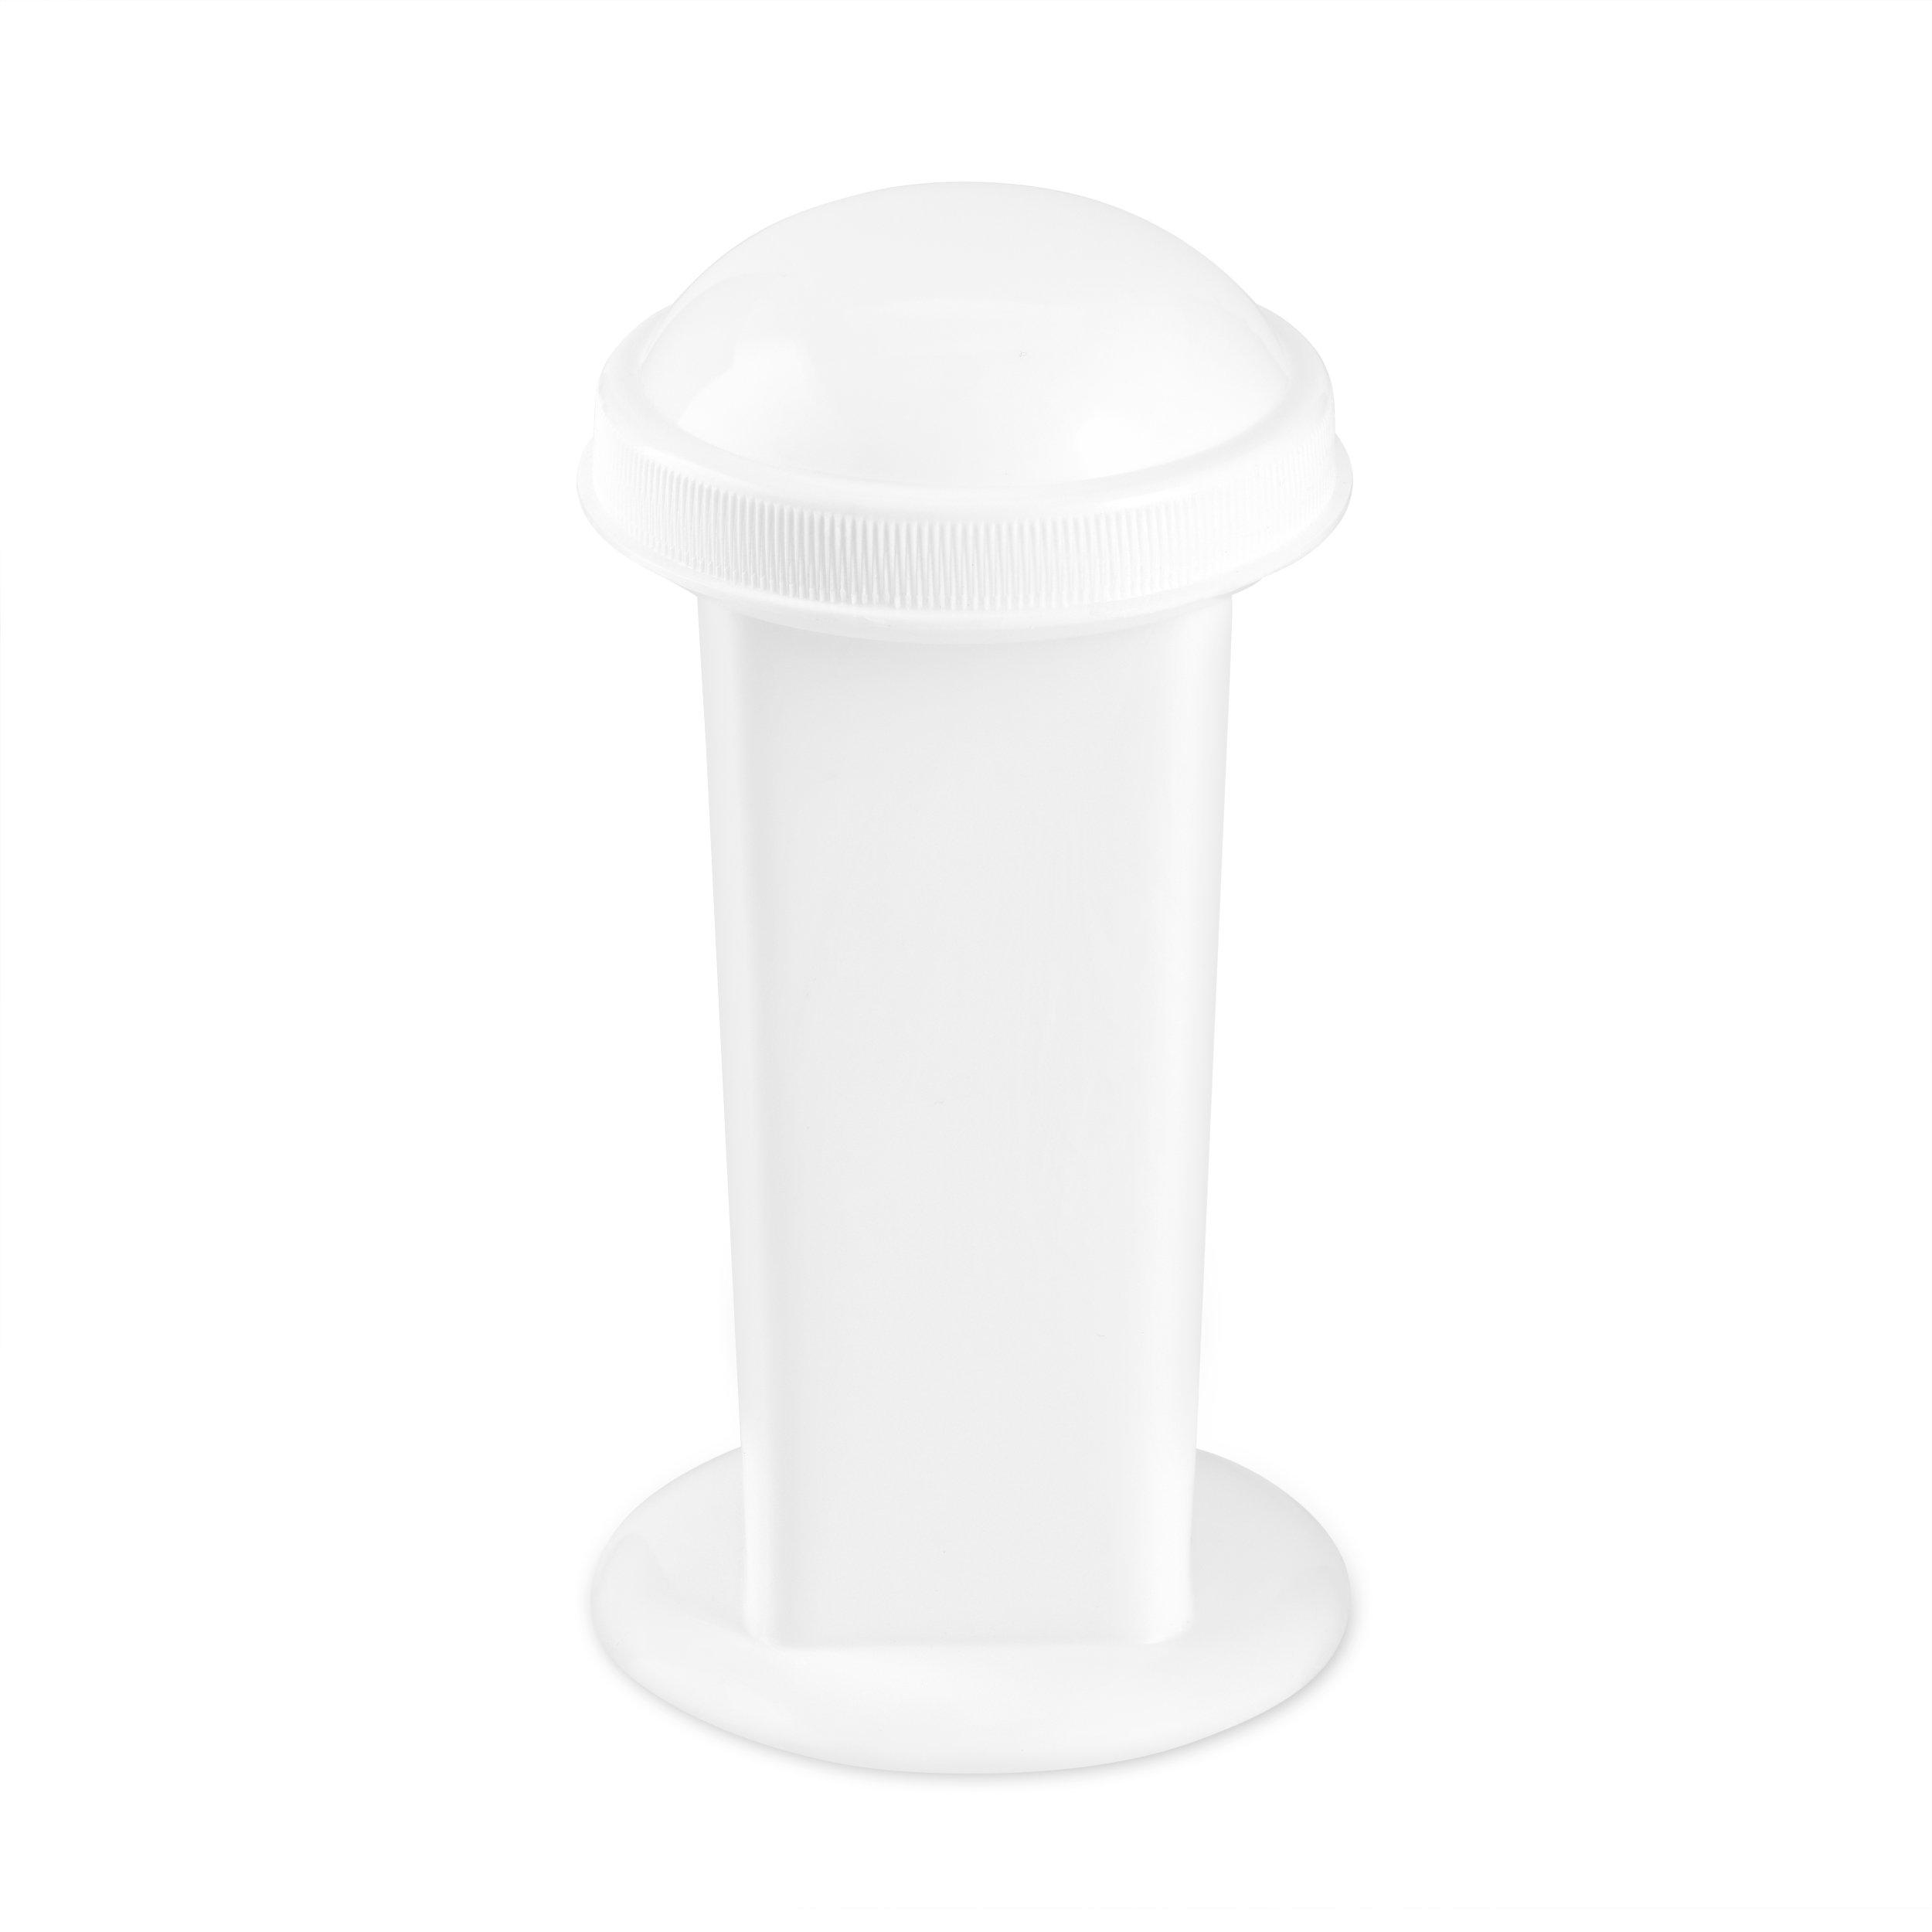 Slide Staining Jar Polypropylene Coplin Dish